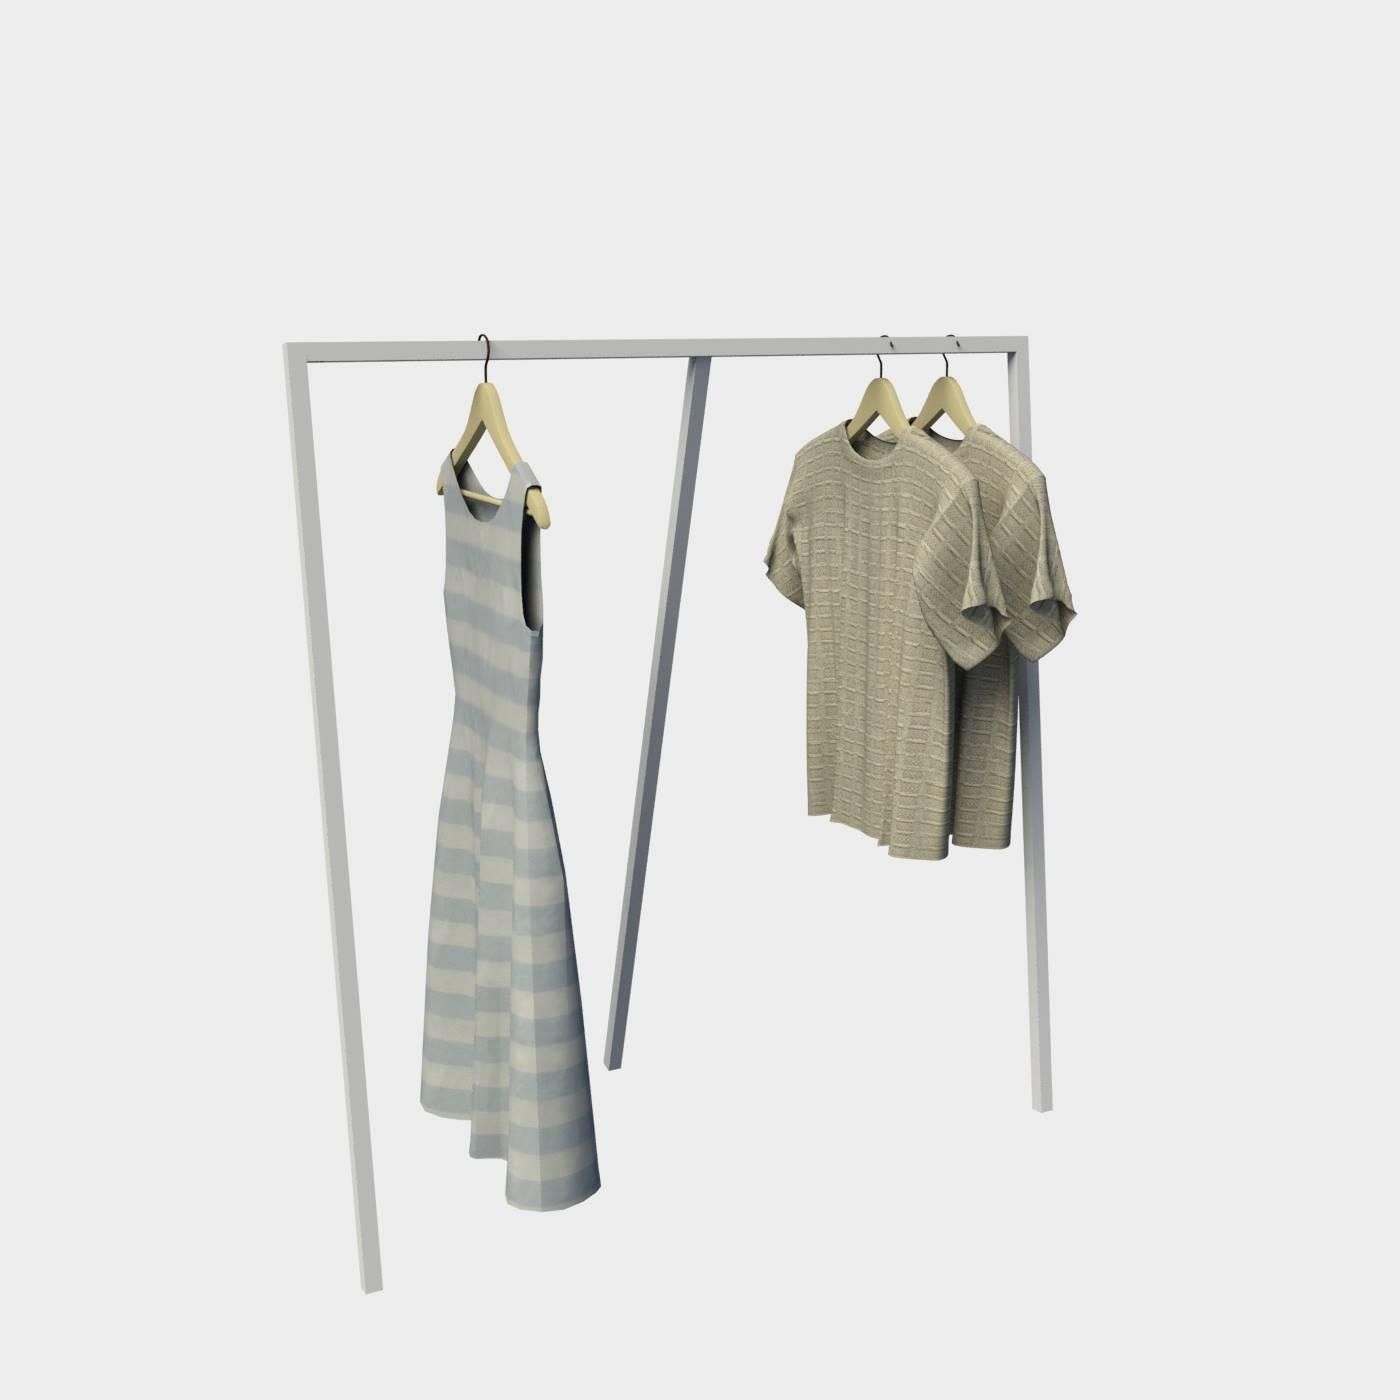 2428080613d Stand μεταλλικό ρούχων κρεμασης επιπλα καταστημάτων εξοπλισμός καταστηματος